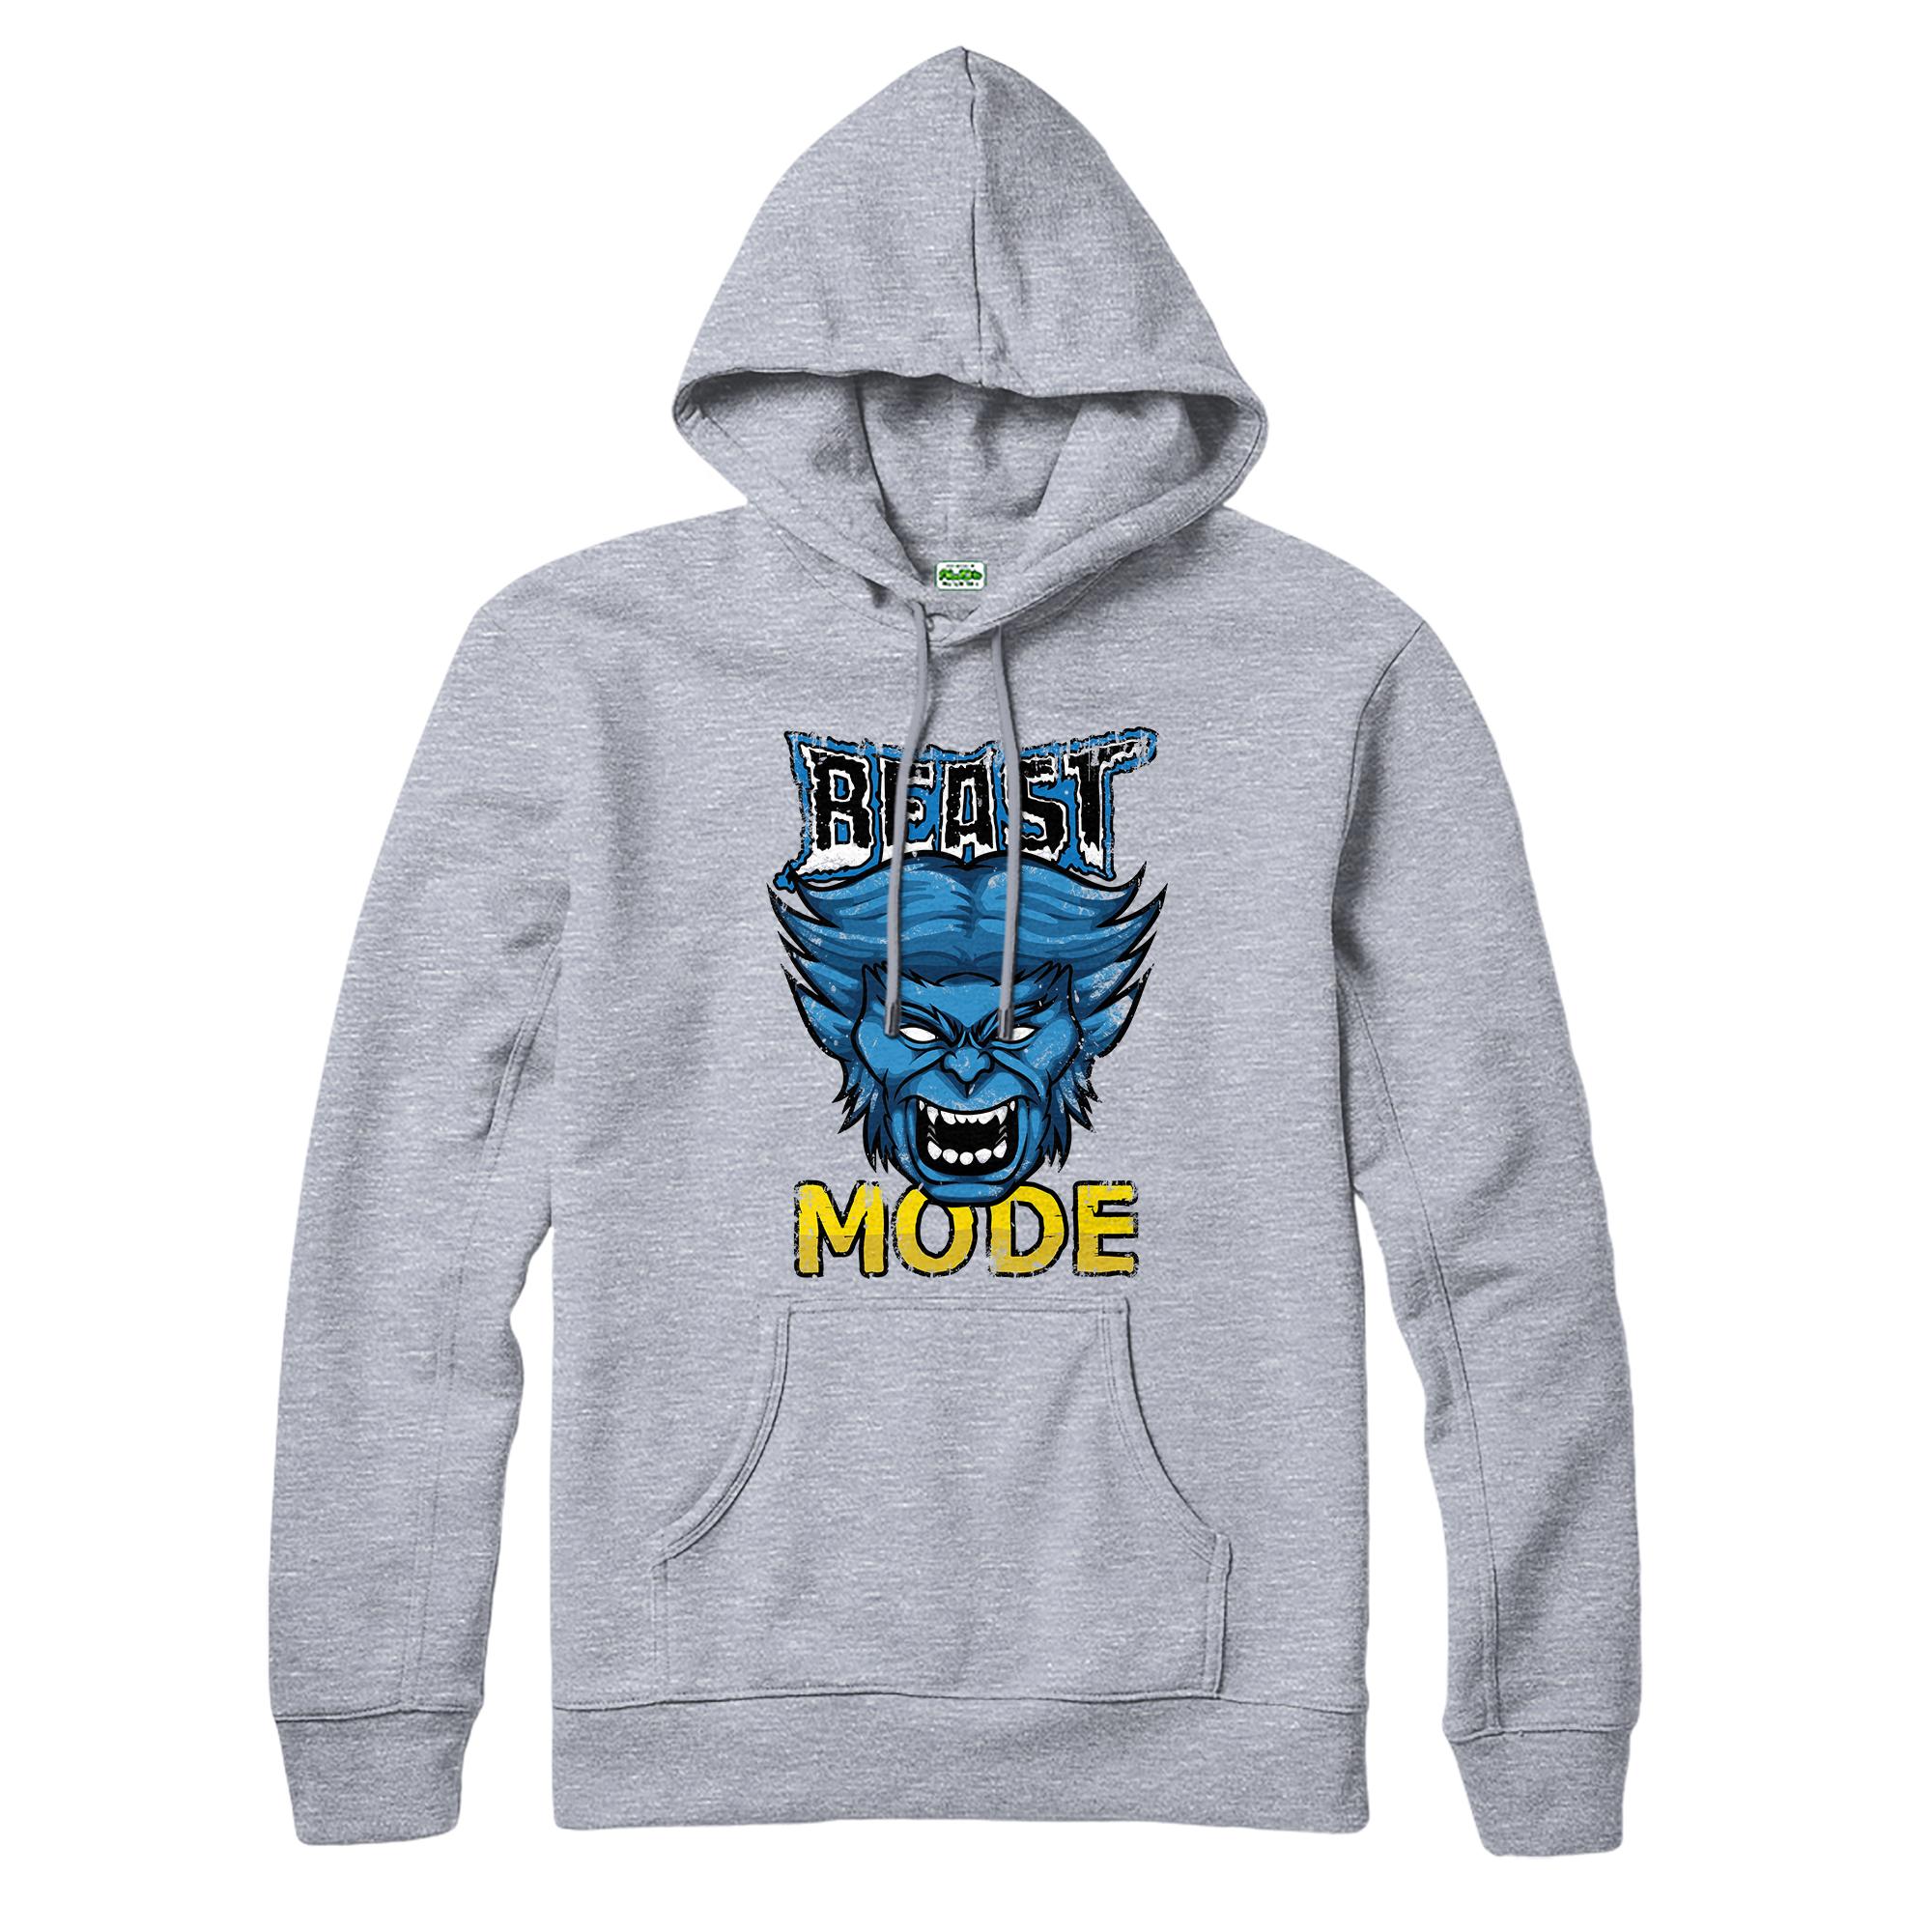 Beast-mode-X-Men-Hoodie-gym-spoof-inspred-design-Superhero-Marvel-top